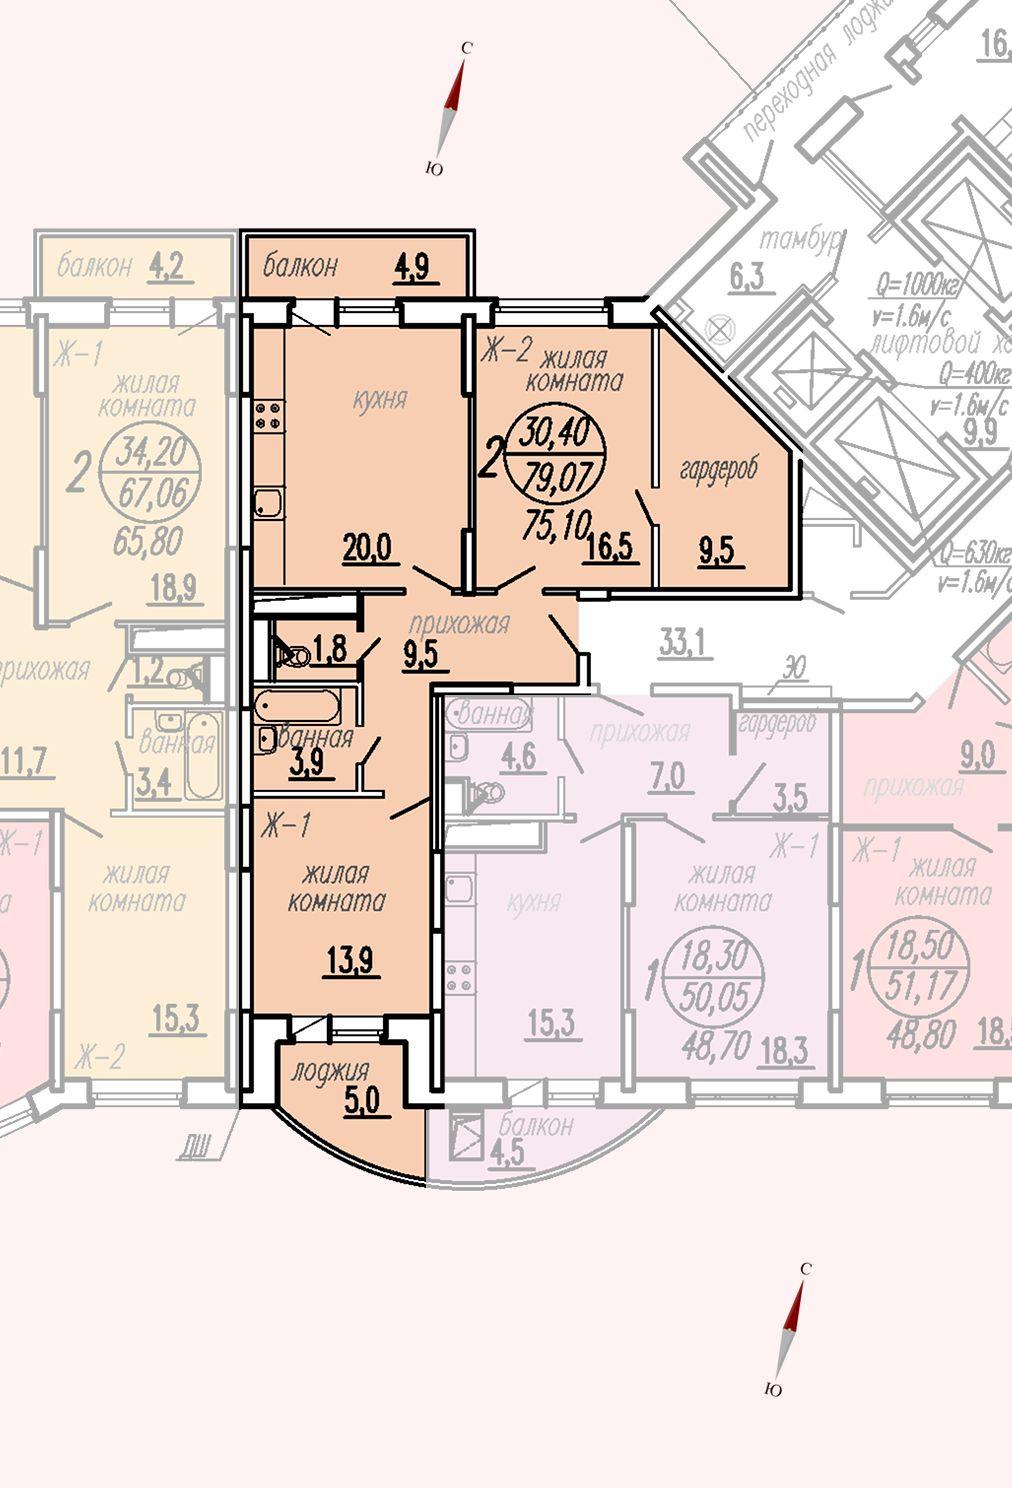 ул. Дирижабельная, д. 1, секция3, квартира 79,07 м2